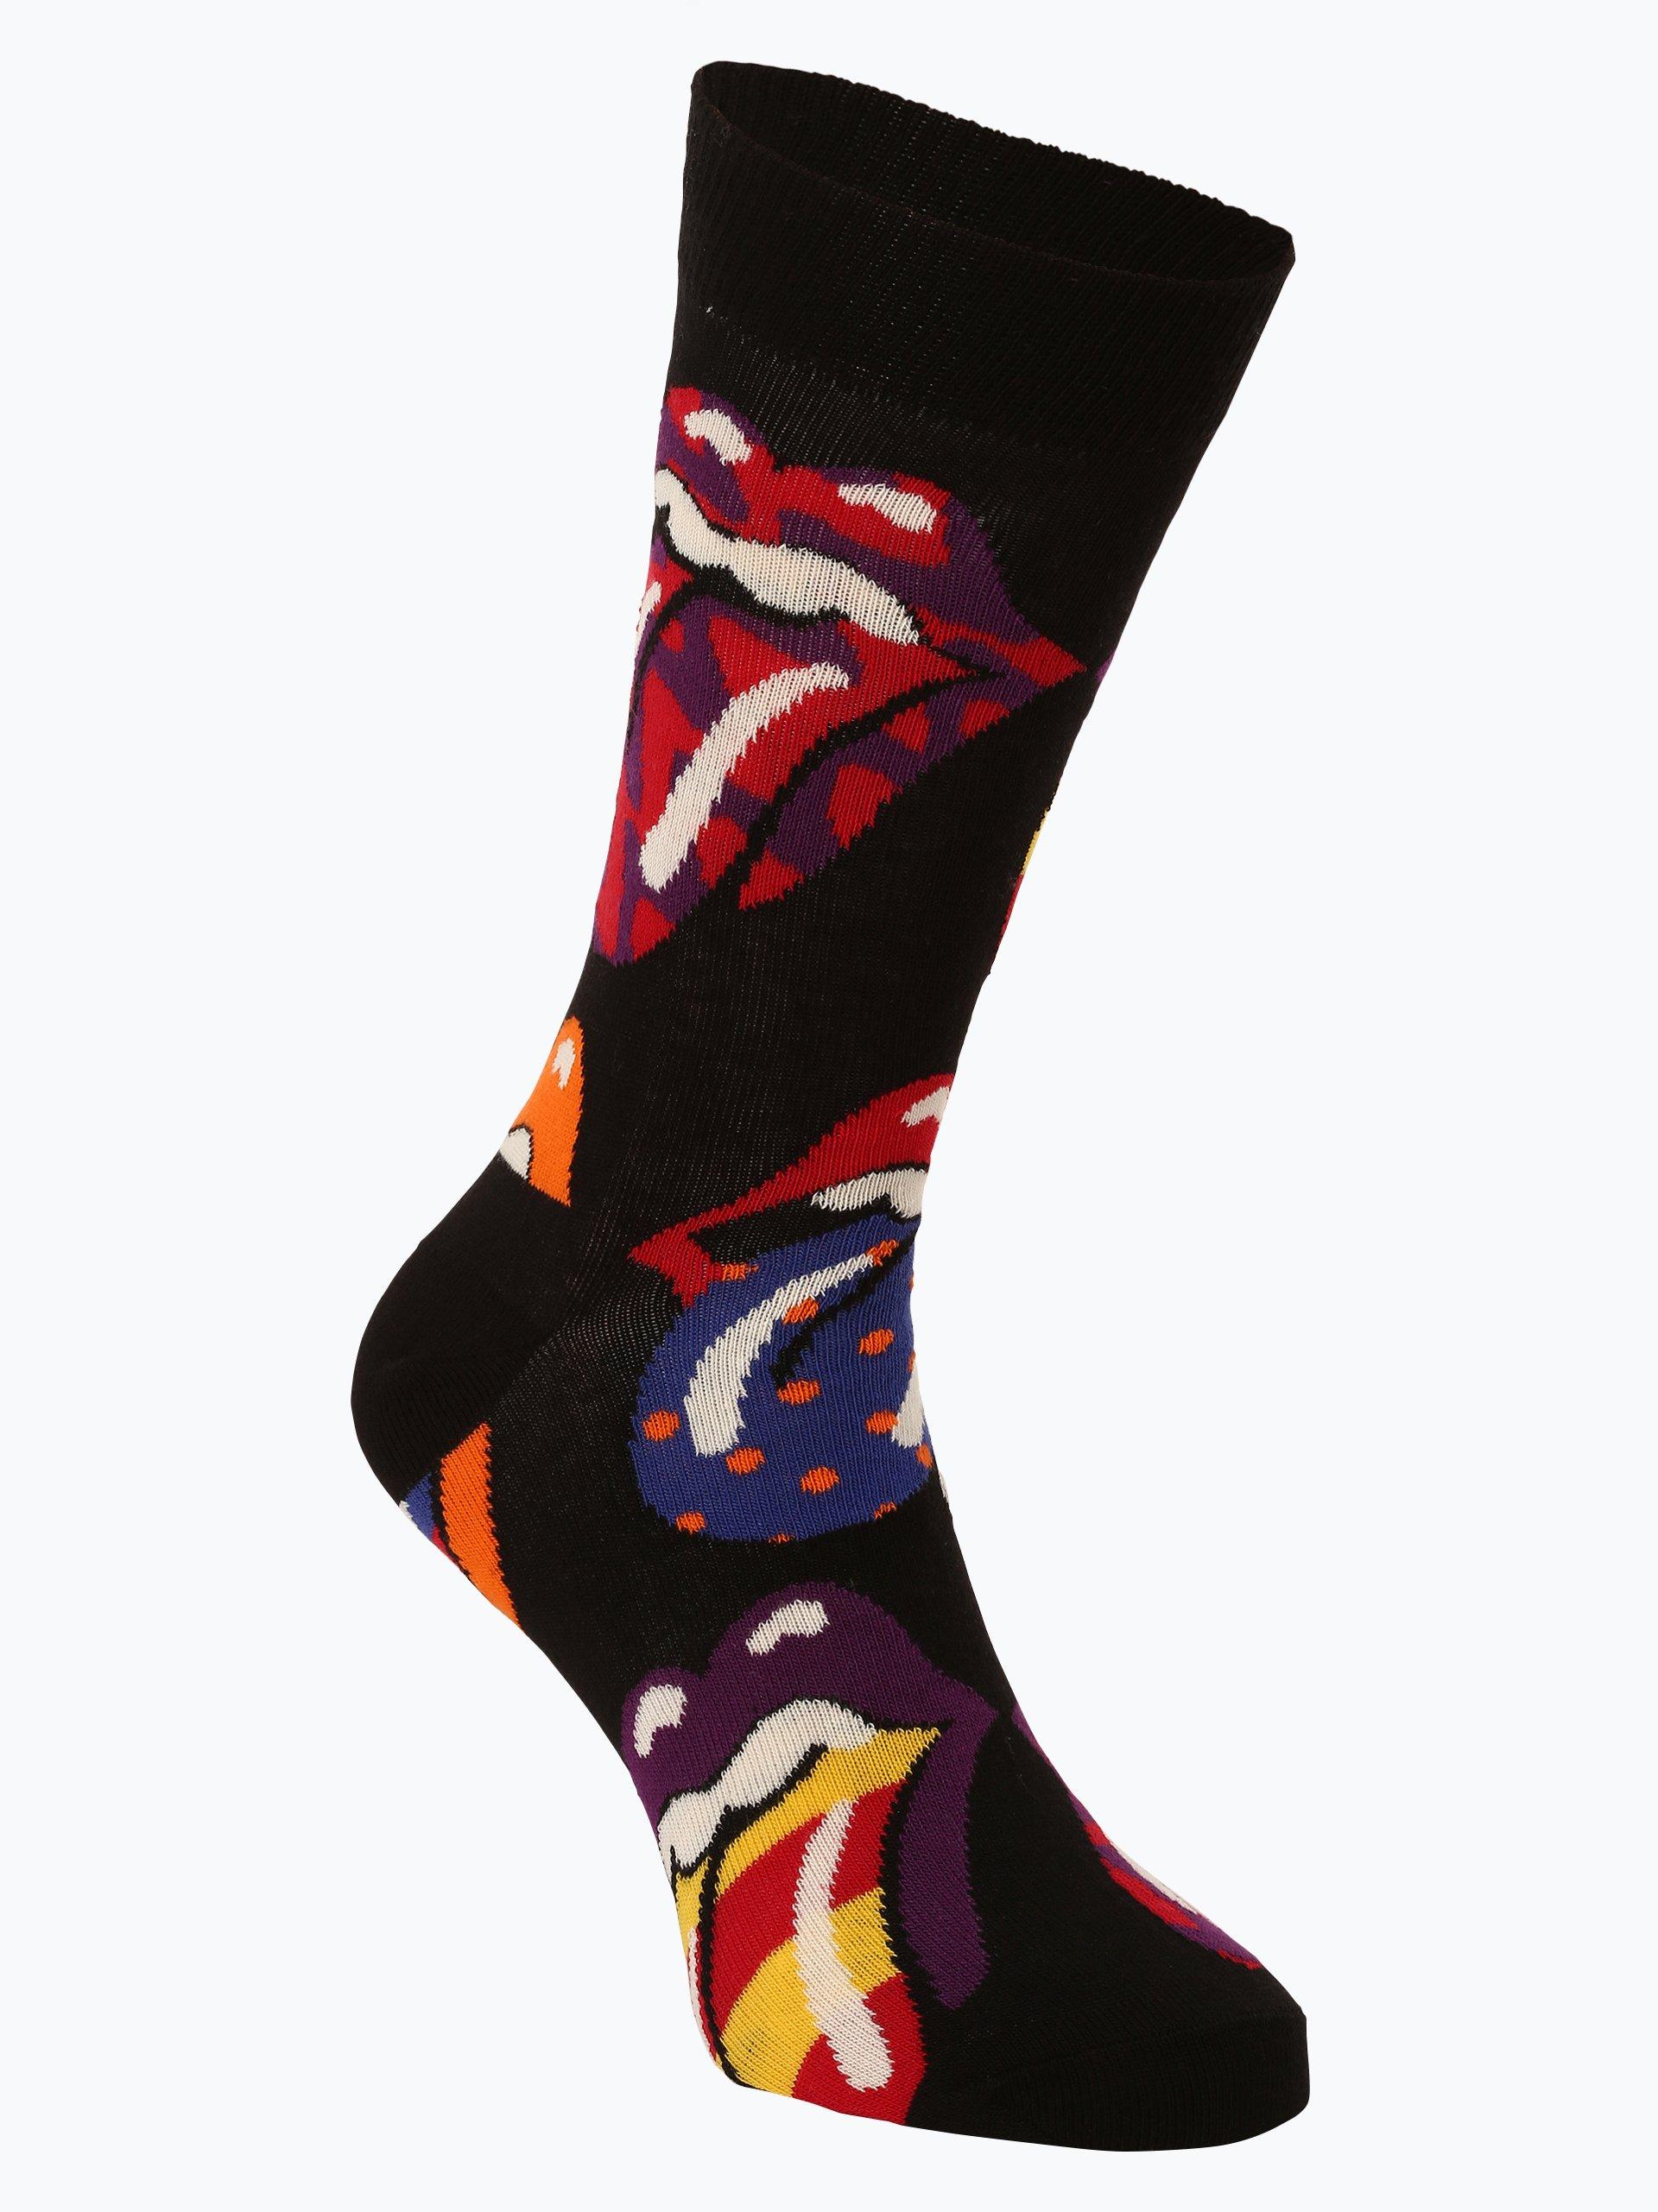 Happy Socks Feinstrick-Socken - Rolling Stones